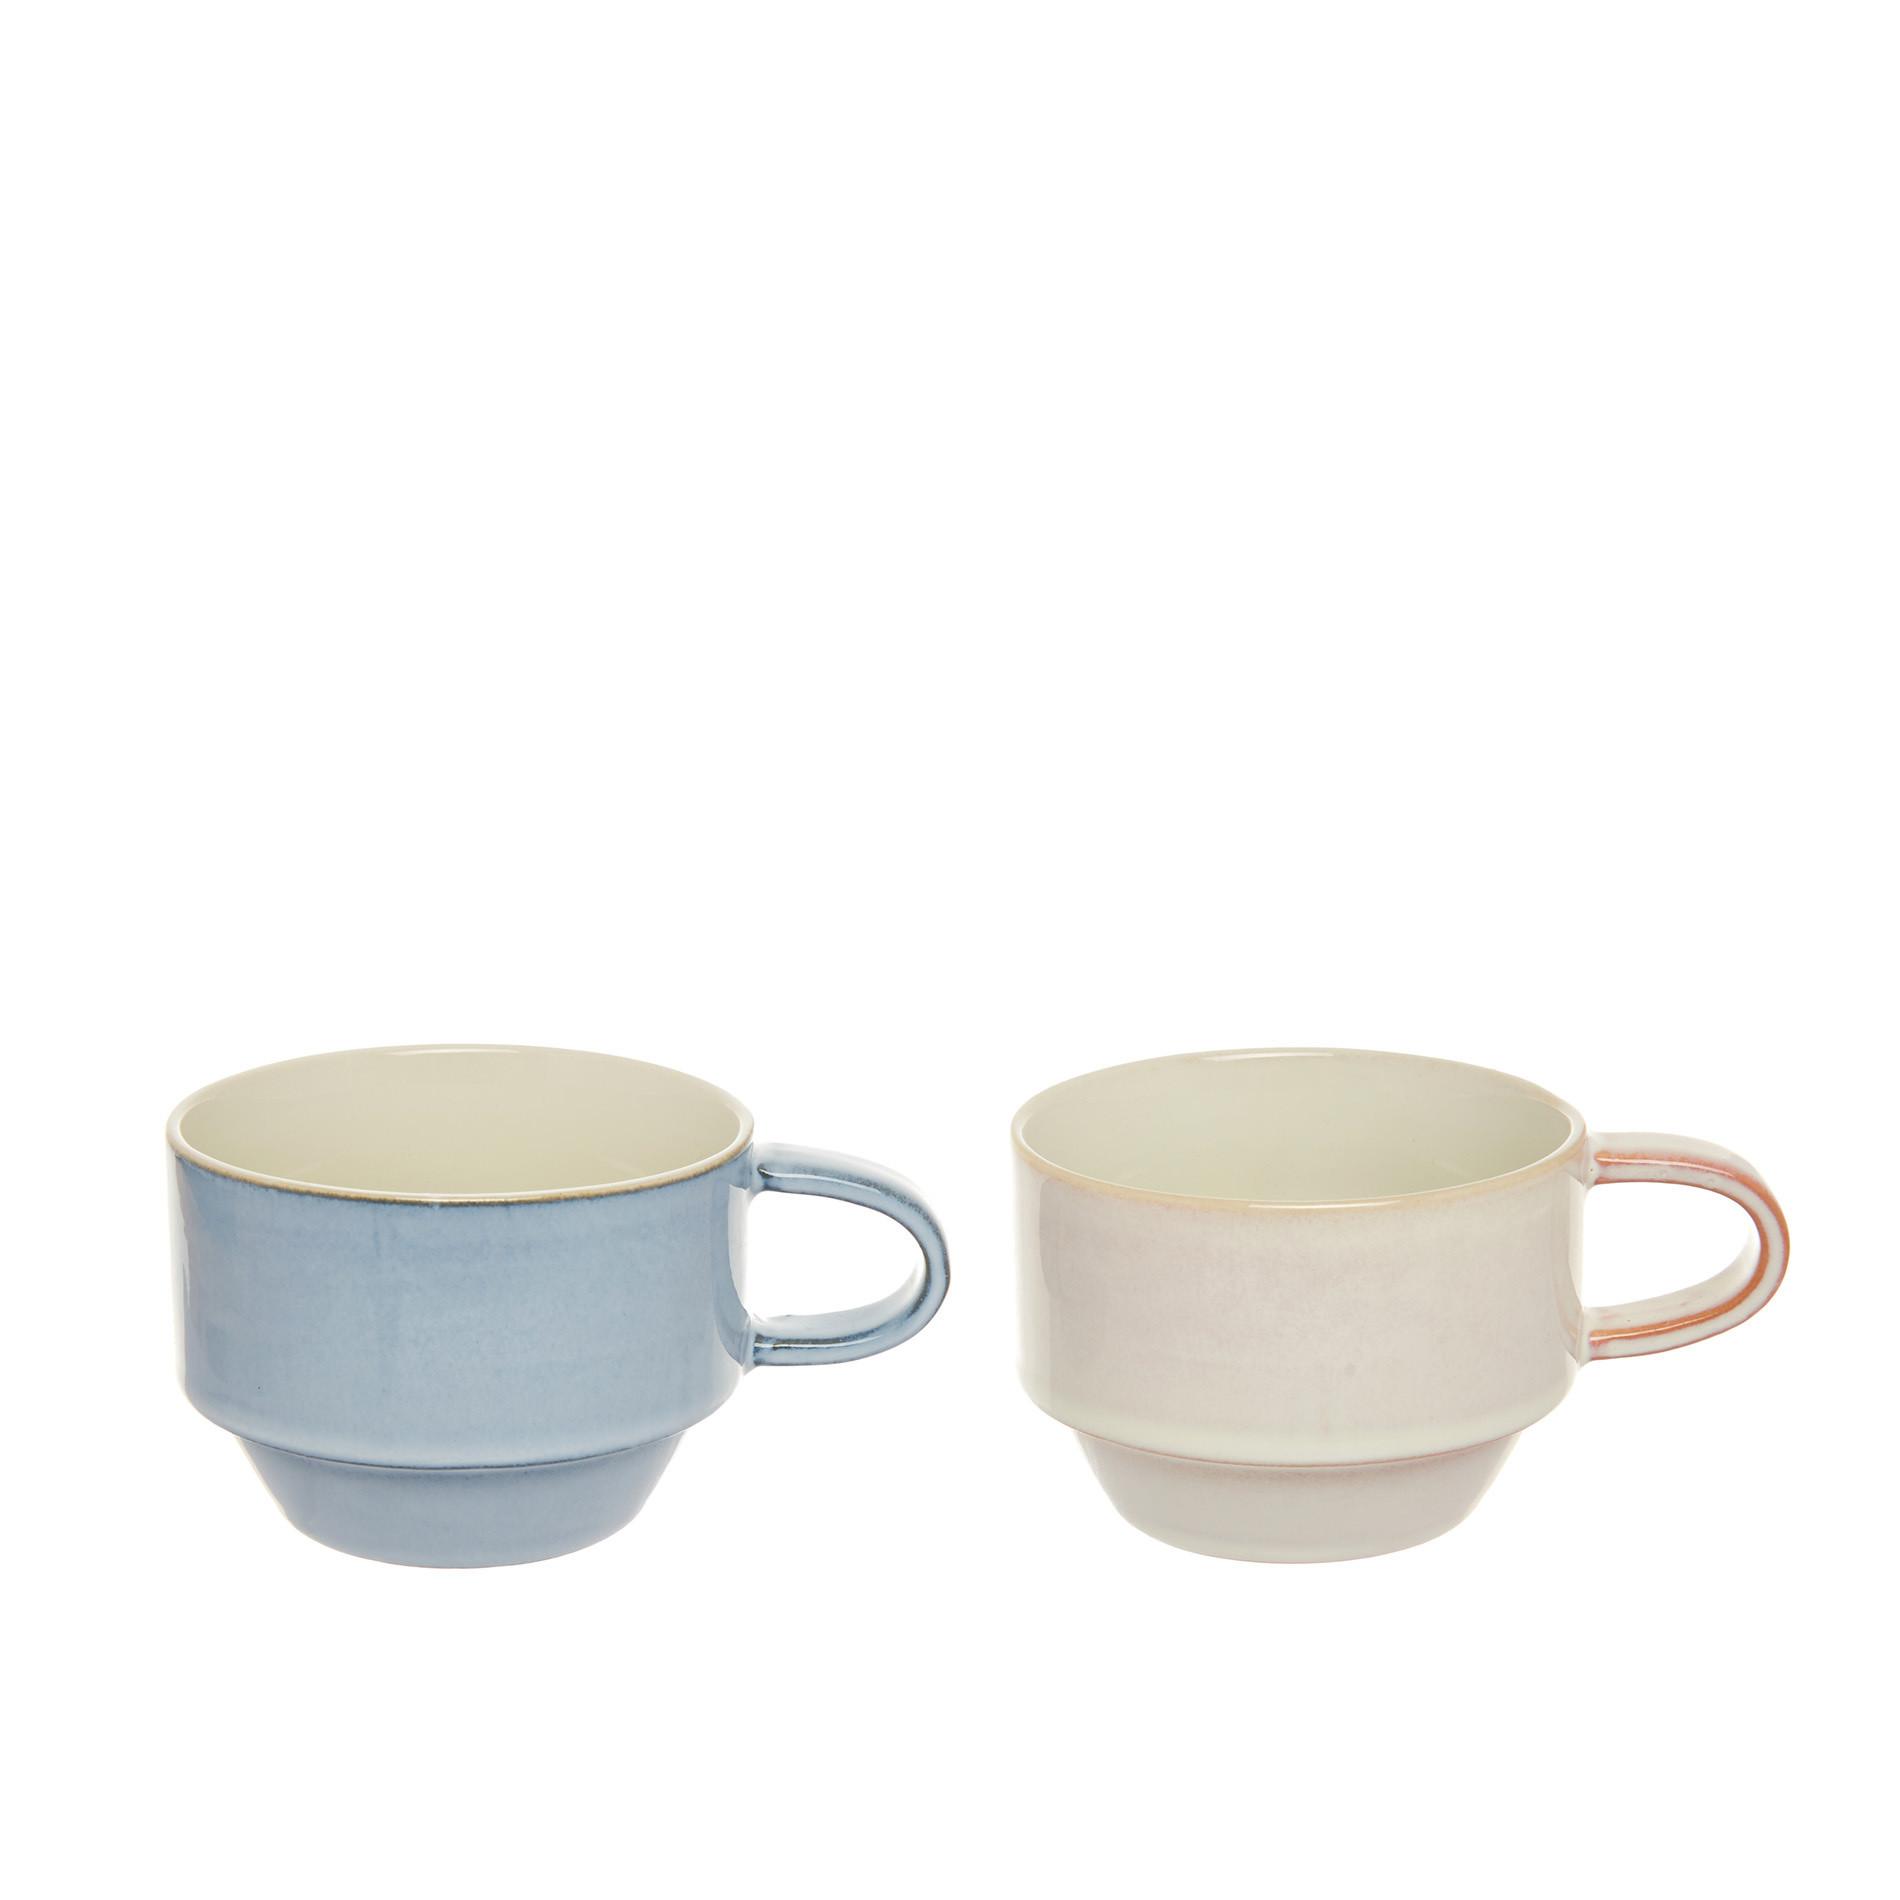 Tazze da tè stoneware colorate, Multicolor, large image number 1